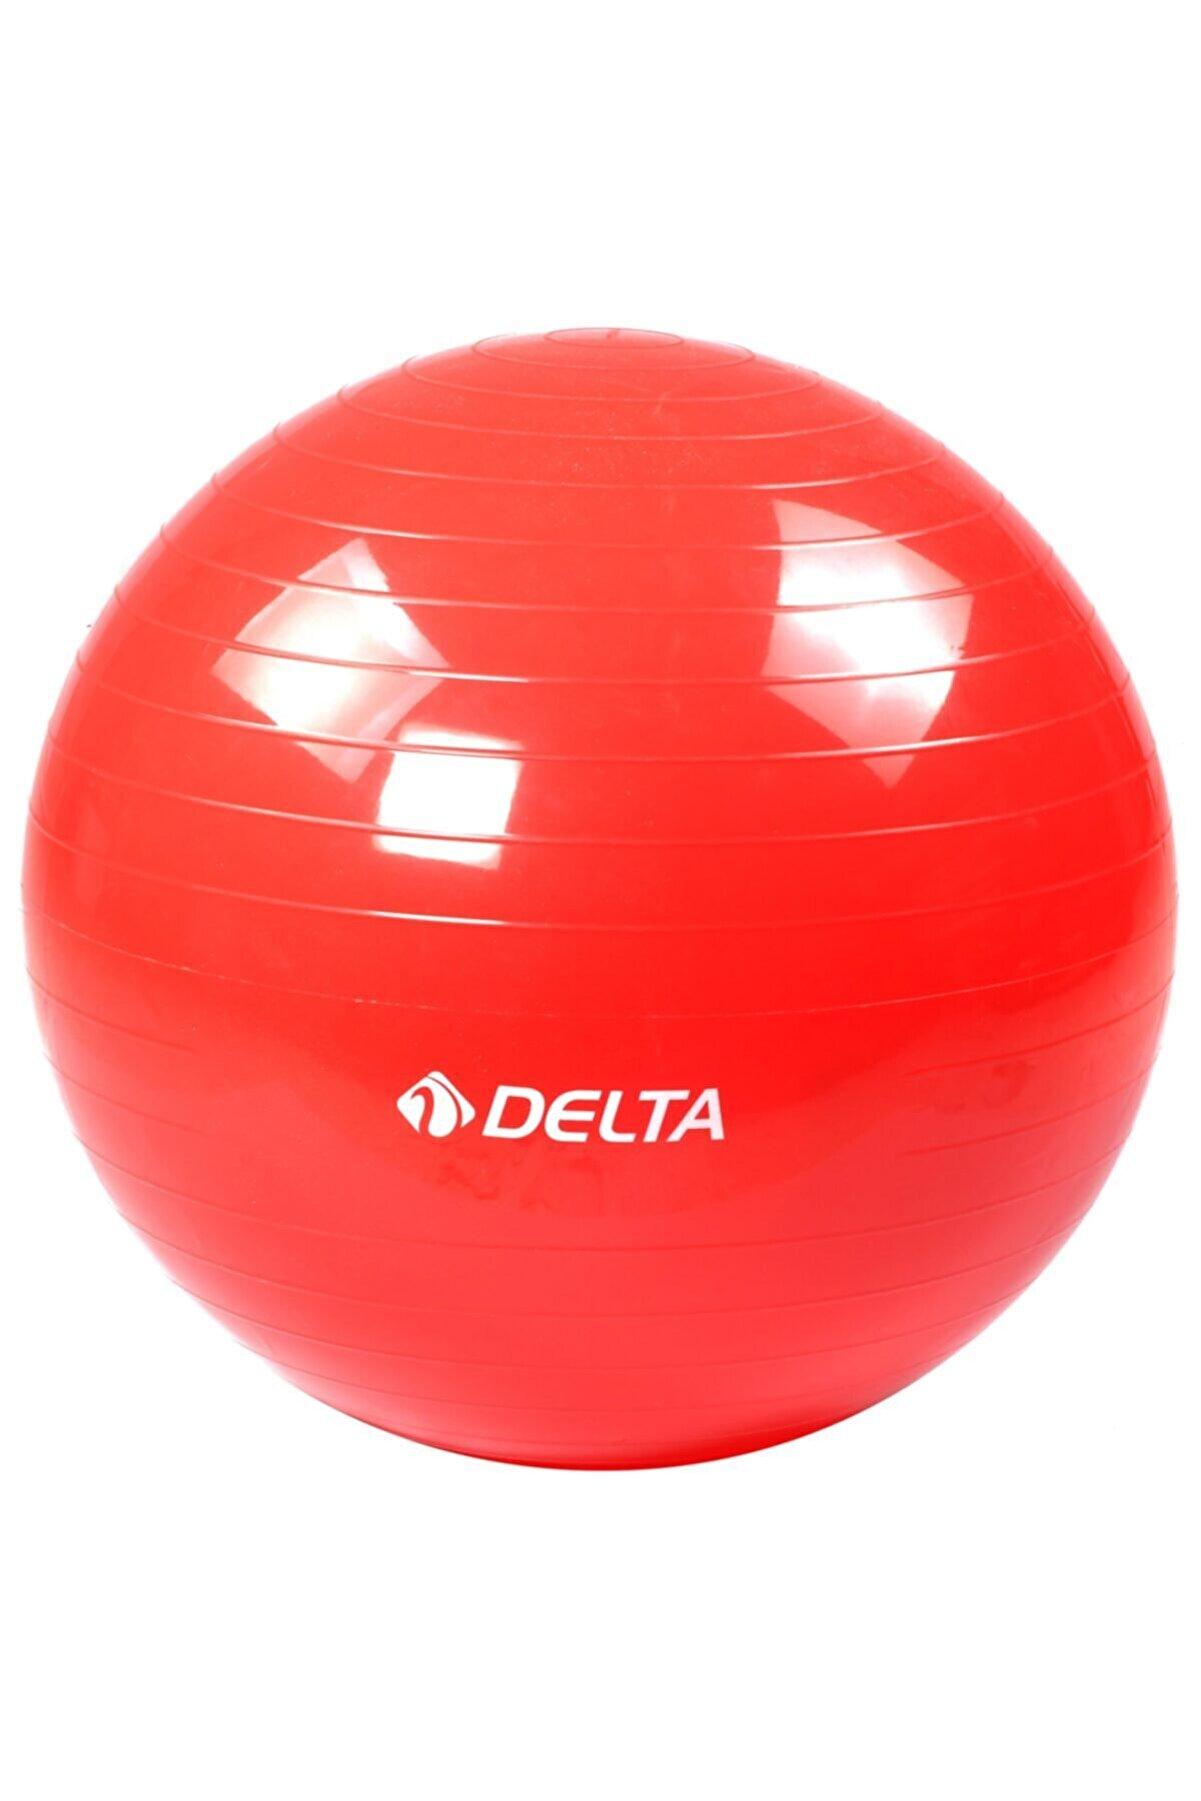 Delta Dura-Strong Deluxe Kırmızı Pilates Topu 55 cm